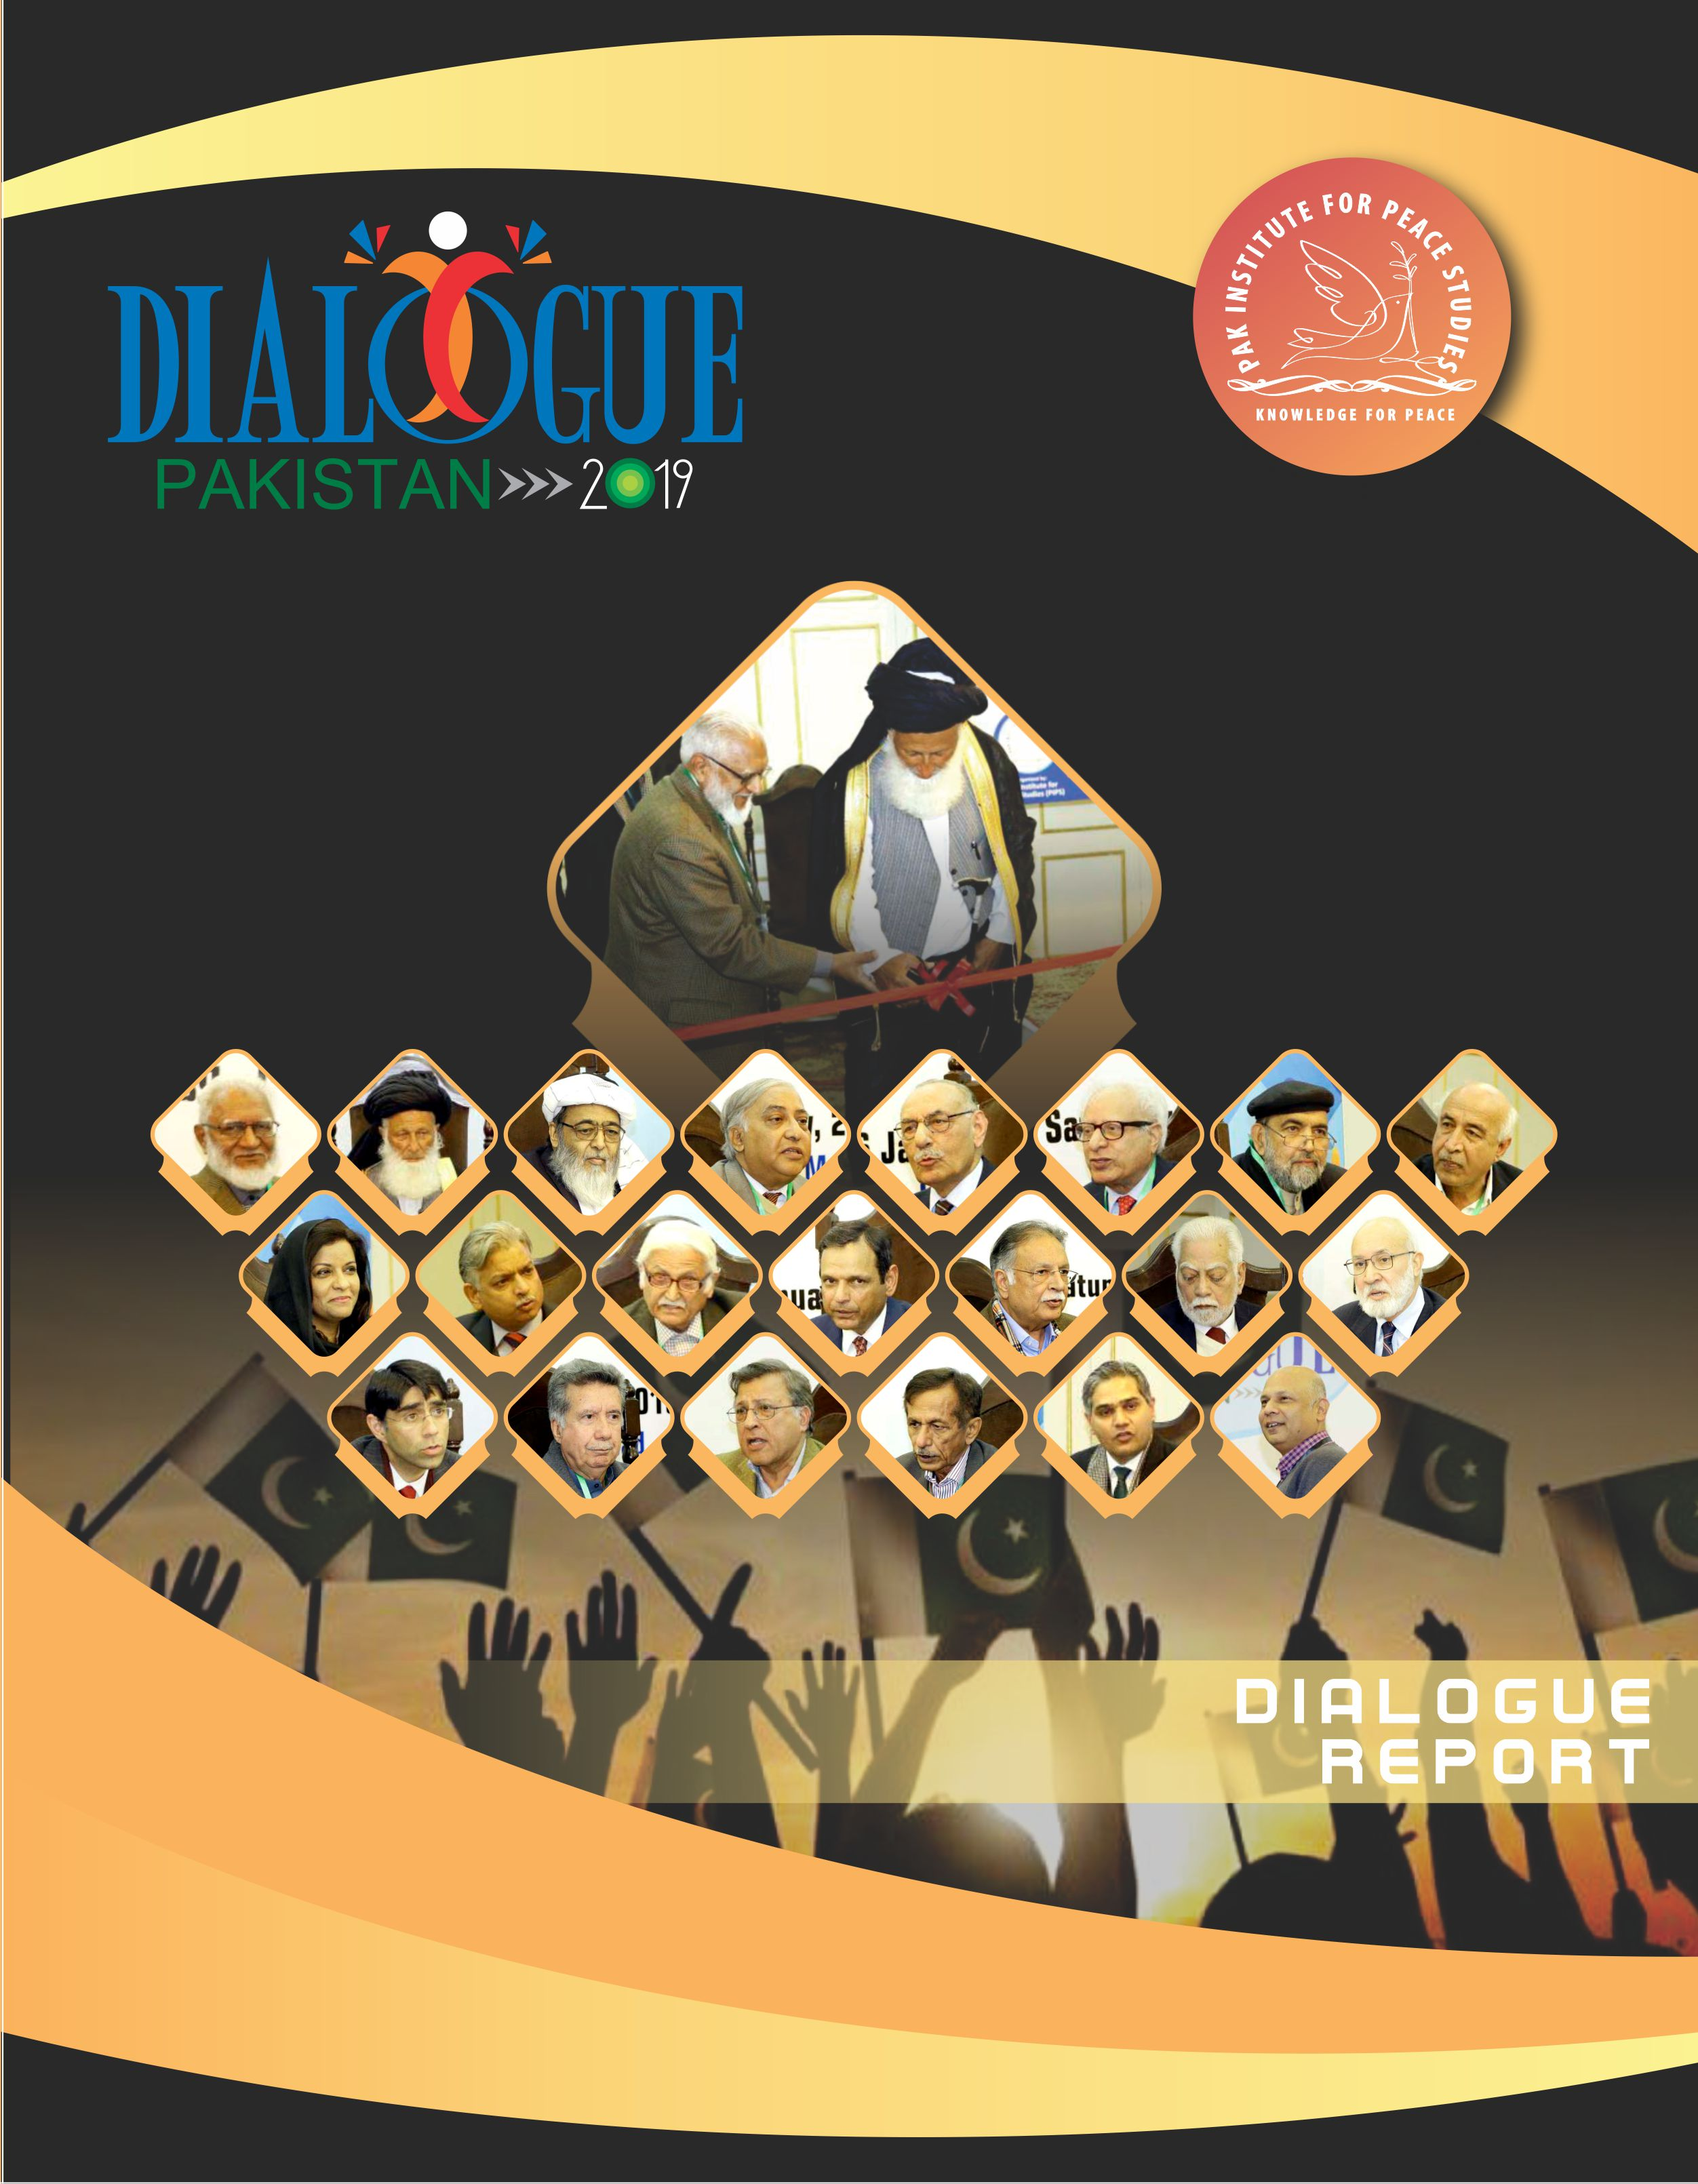 Dialogue Pakistan 2019 report – Pak Institute For Peace